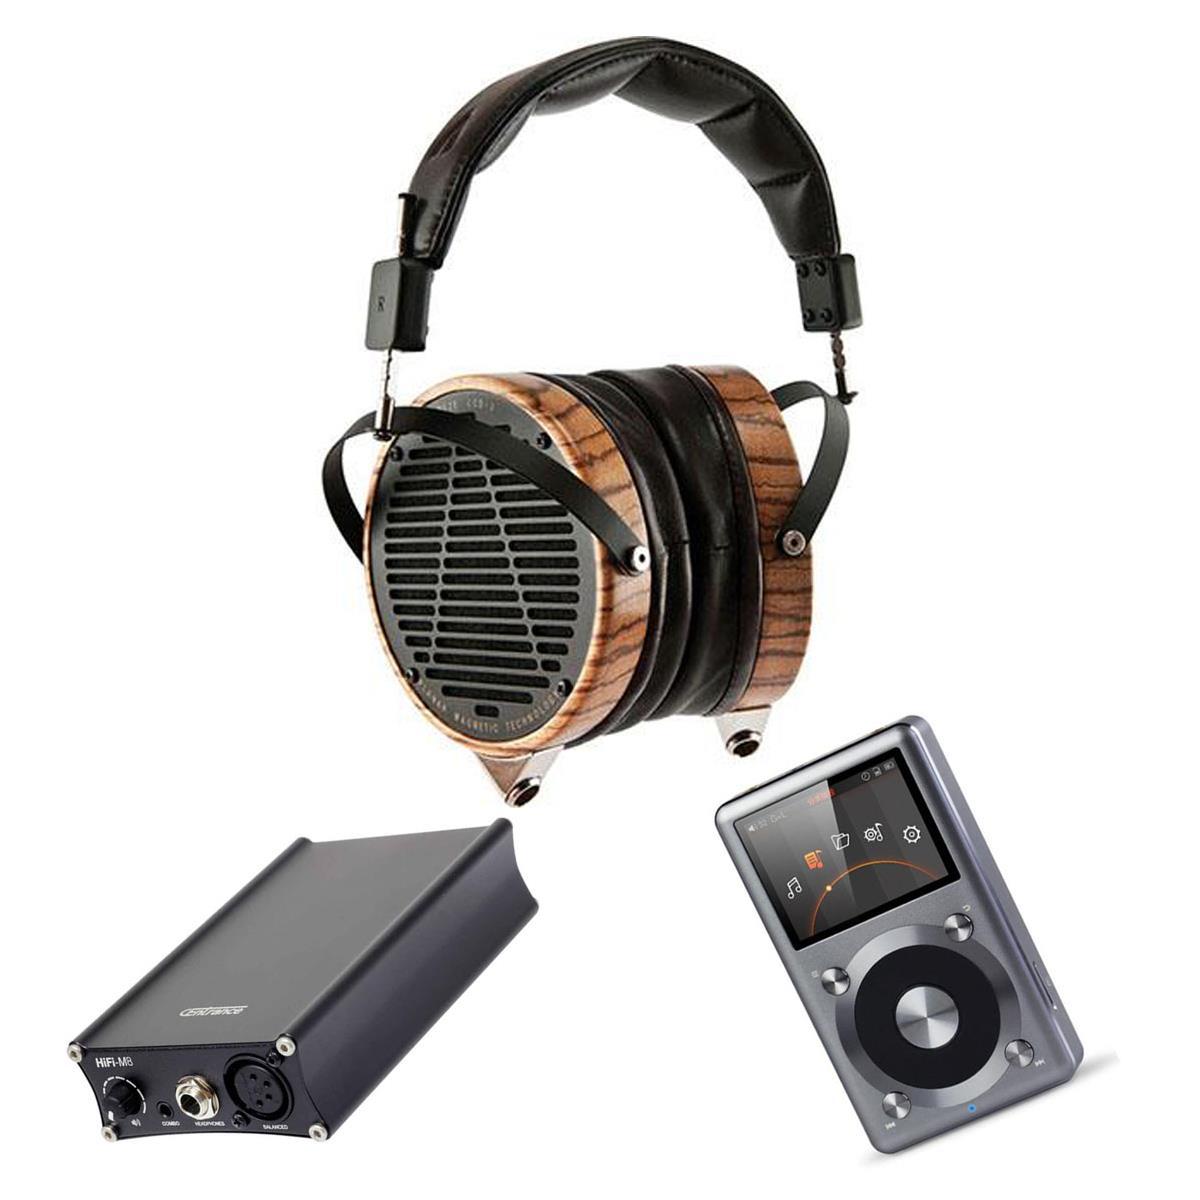 Audeze LCD-3 Planar Magnetic Headphones + Centrance HIFI-M8 XL4 Balanced Amp/Dac  $1945 & More + Free Shipping